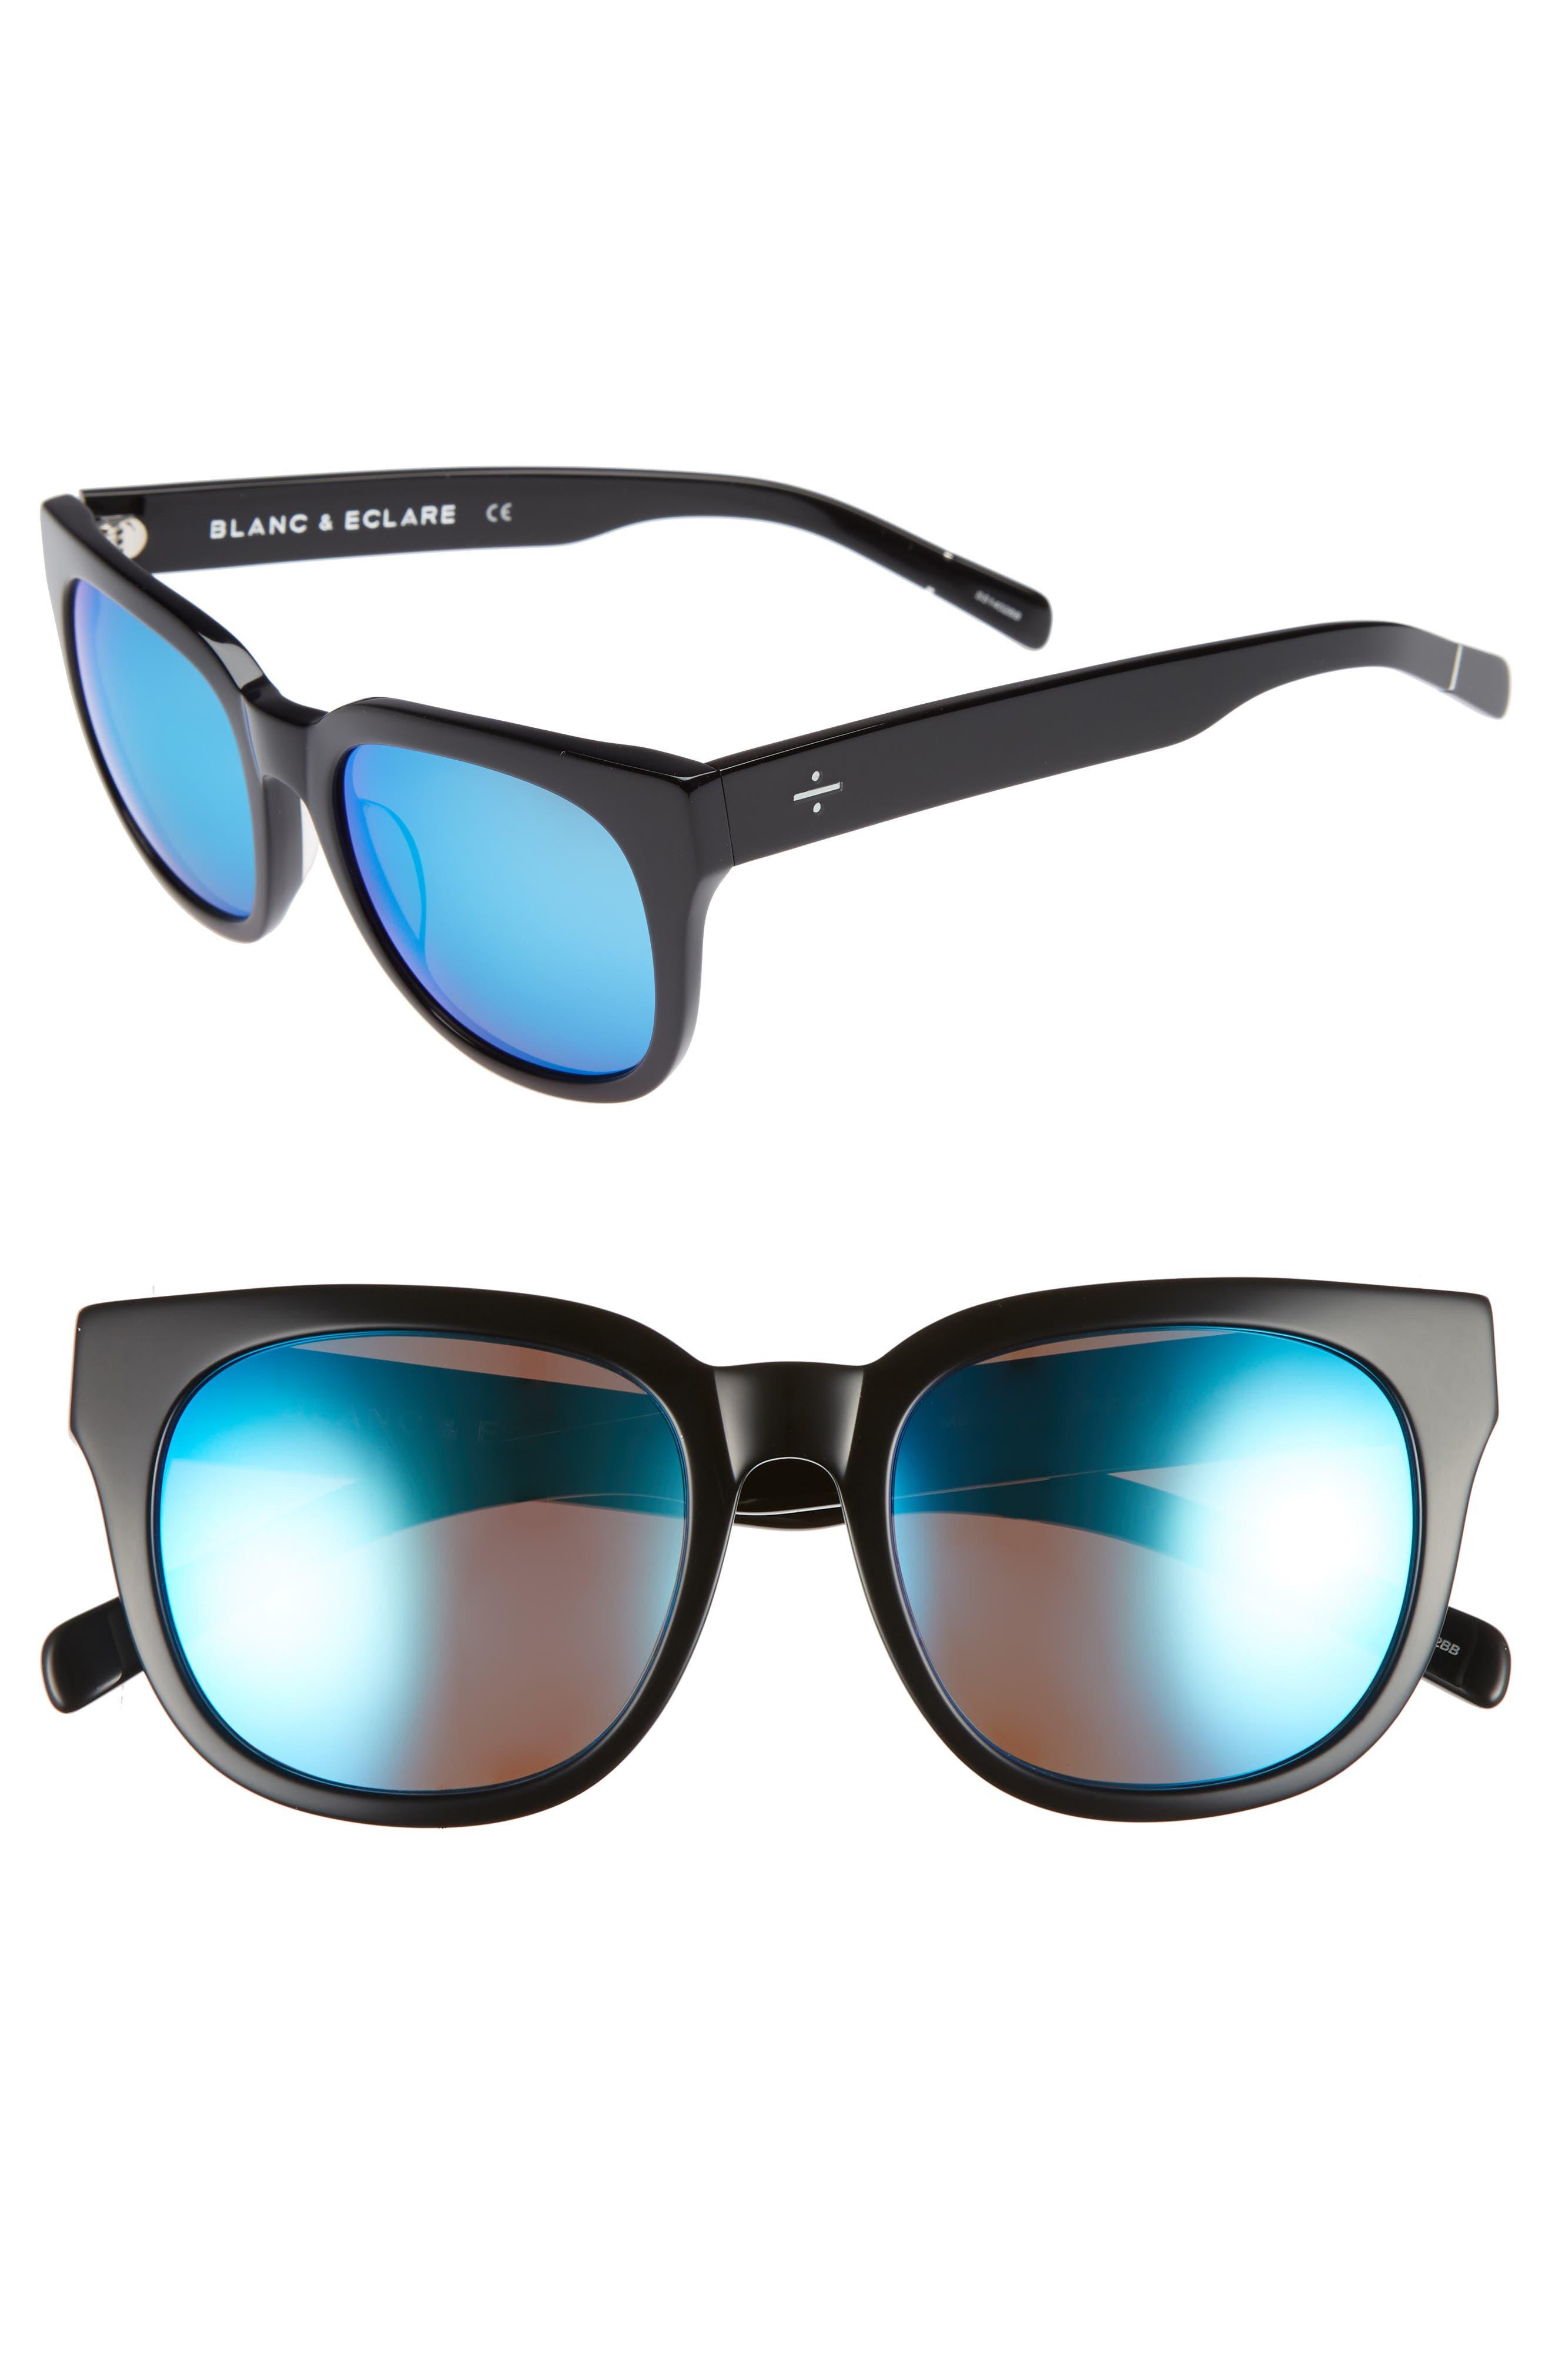 BLANC & ECLARE Seoul 55mm Polarized Sunglasses,                             Main thumbnail 1, color,                             002